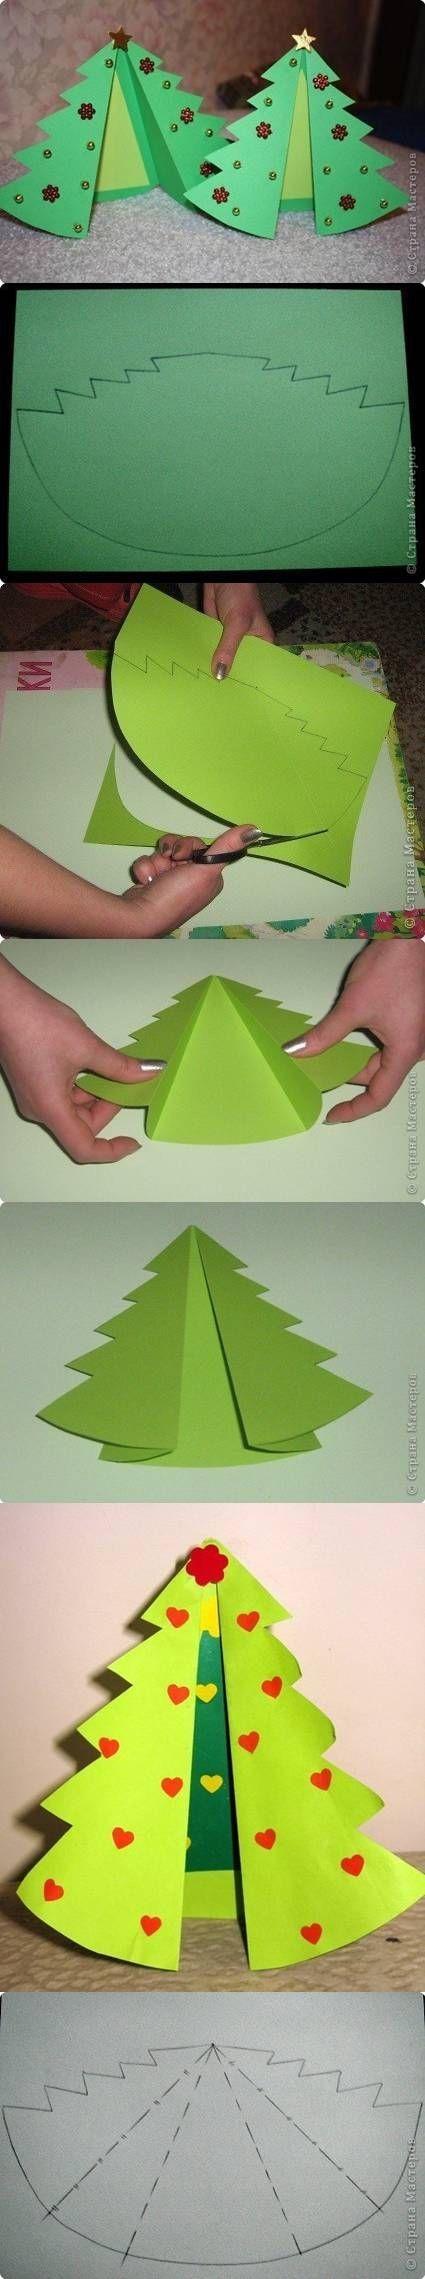 DIY Tree Style Card diy how to tutorial